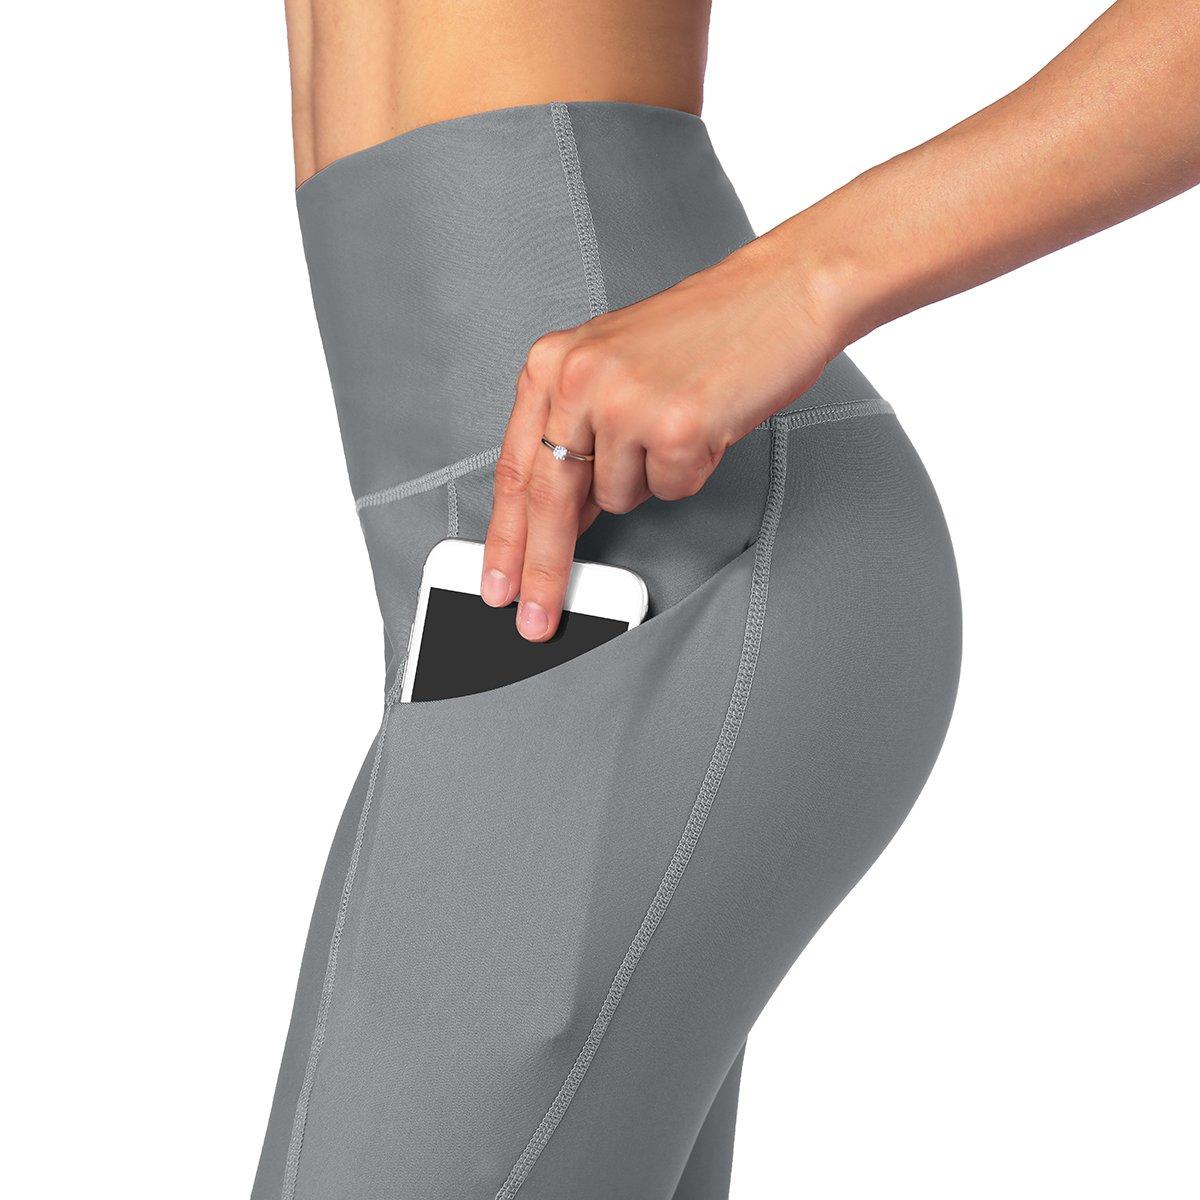 Occffy High Waist Out Pocket Yoga Pants Womens Tummy Control Workout Leggings Oc01